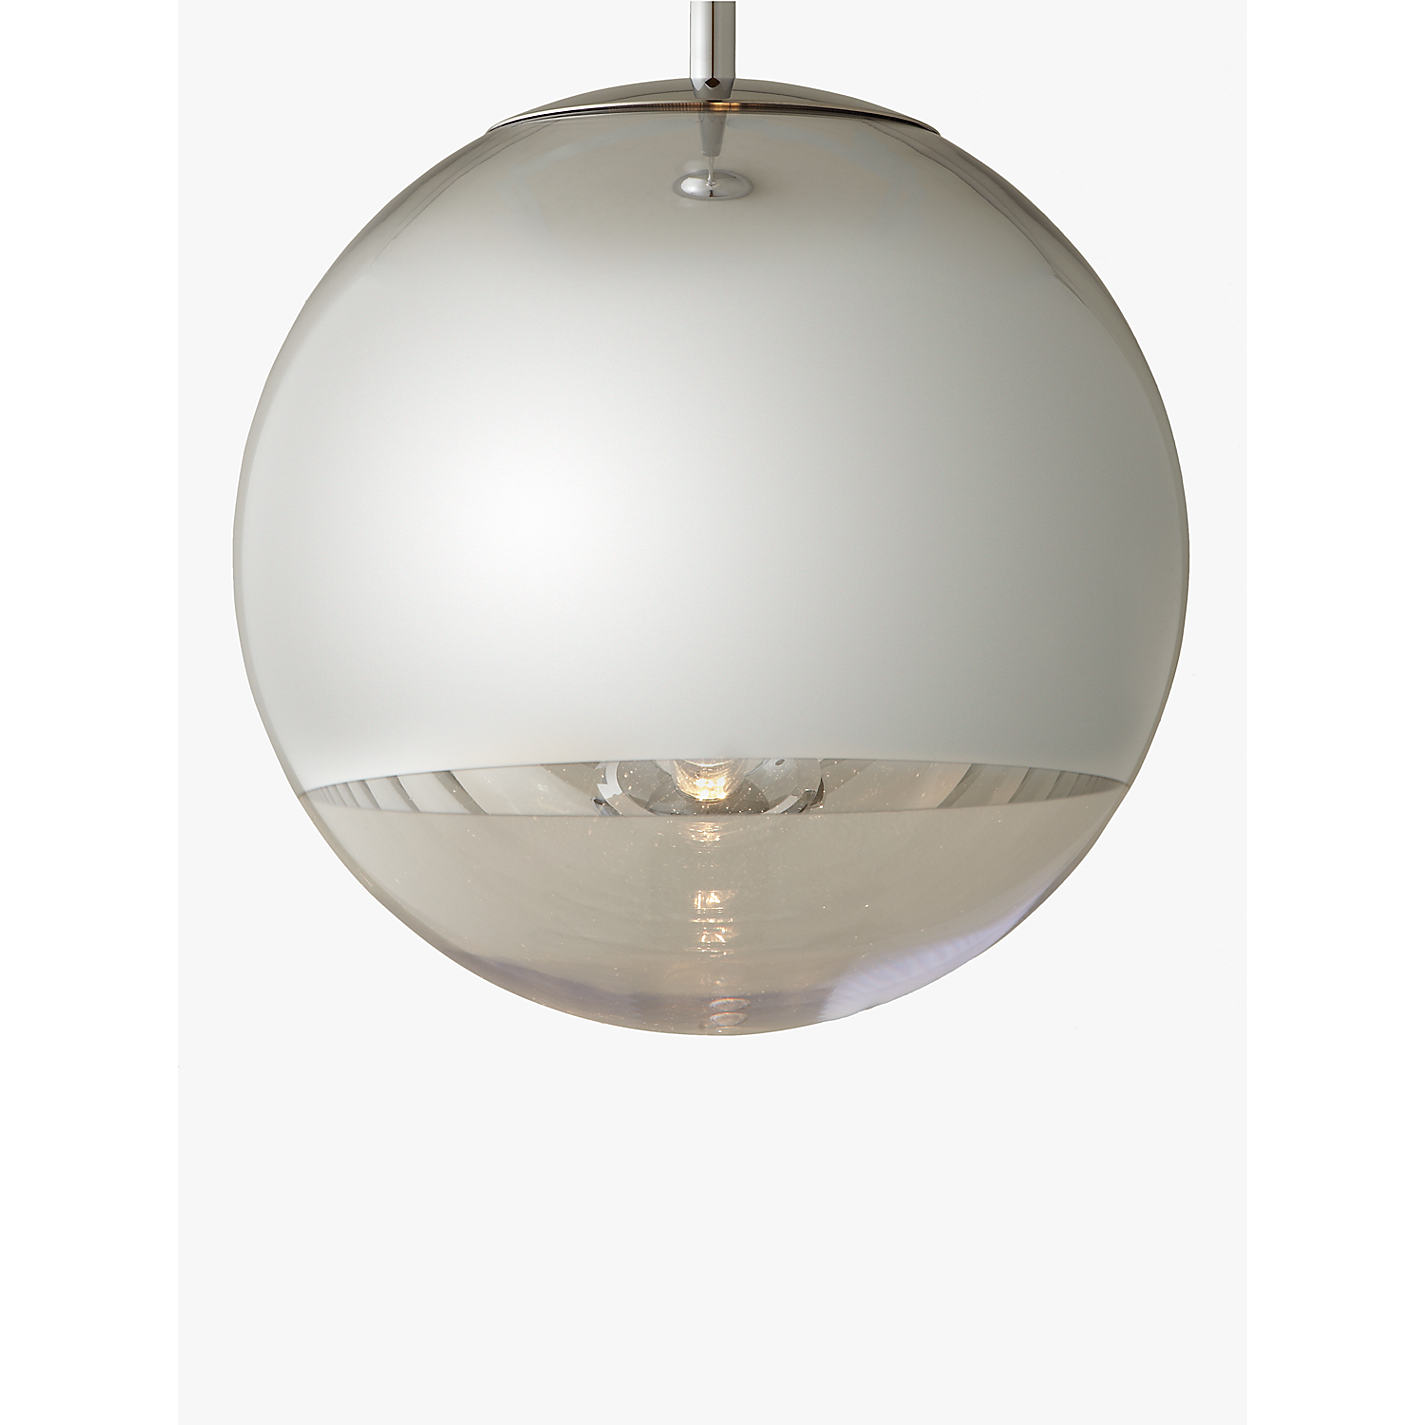 Buy tom dixon mirror ball pendant light john lewis buy tom dixon mirror ball pendant light online at johnlewis mozeypictures Images